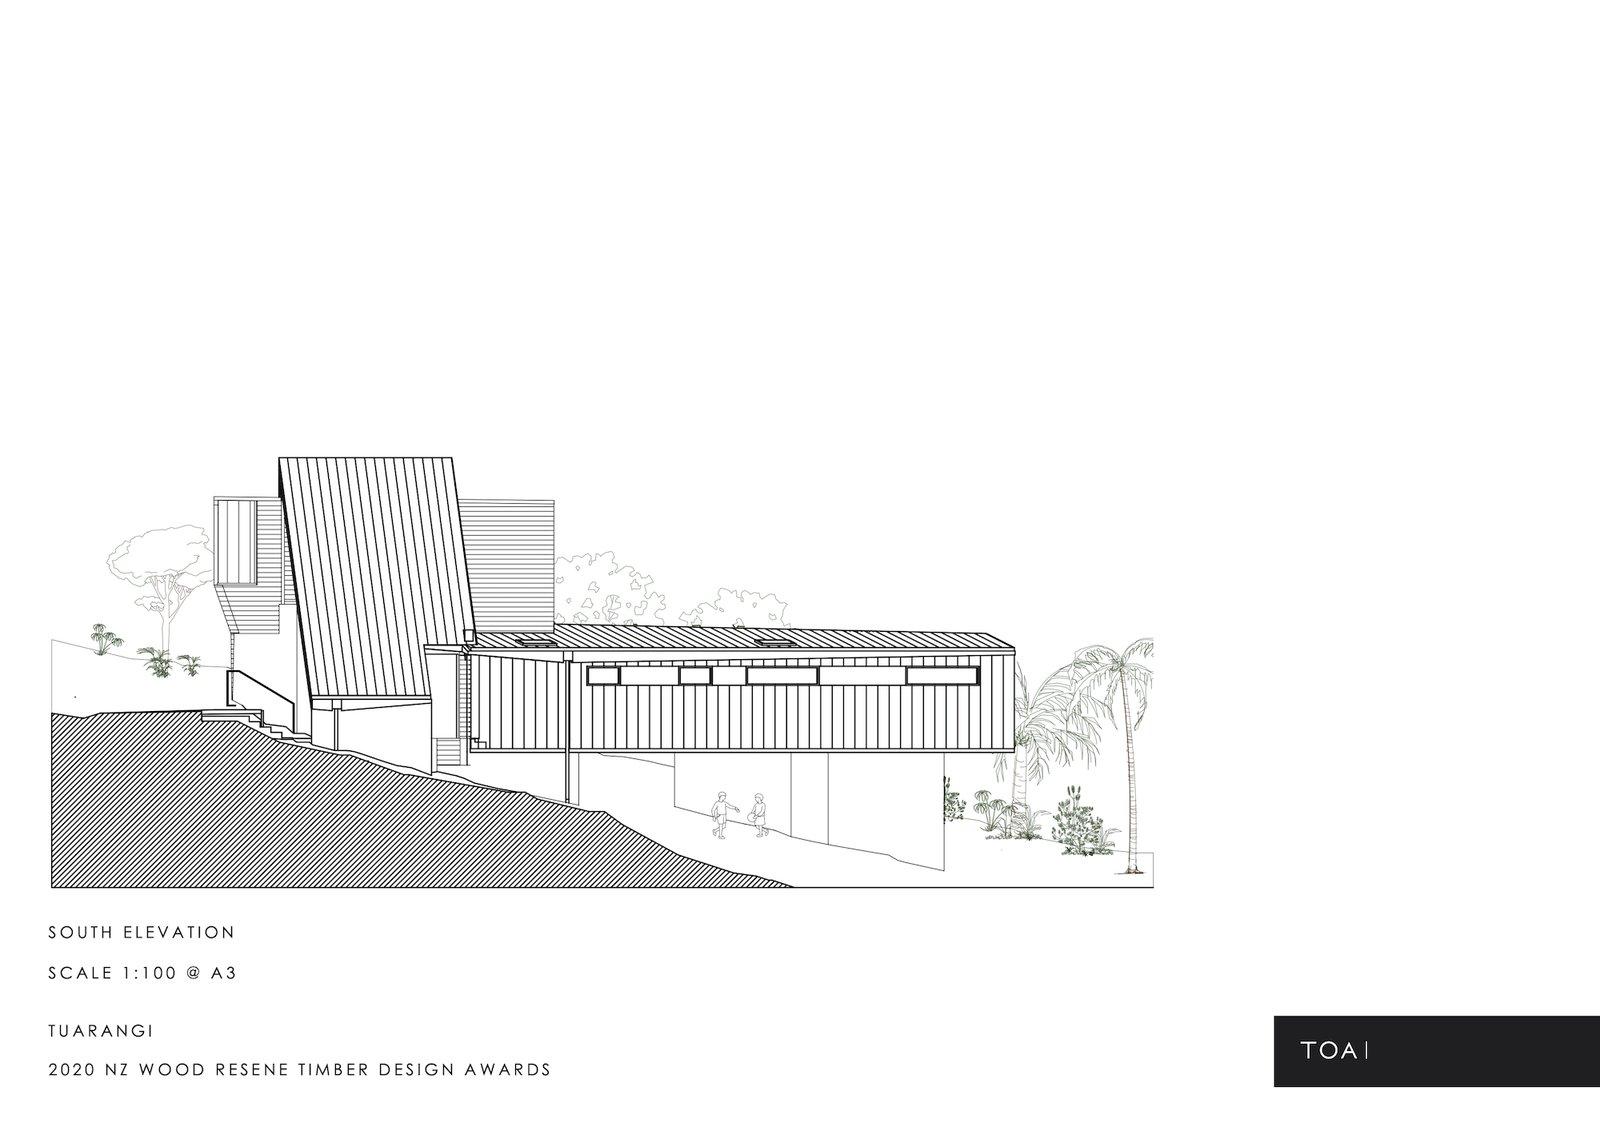 South elevation of Tuarangi House by TOA Architects.